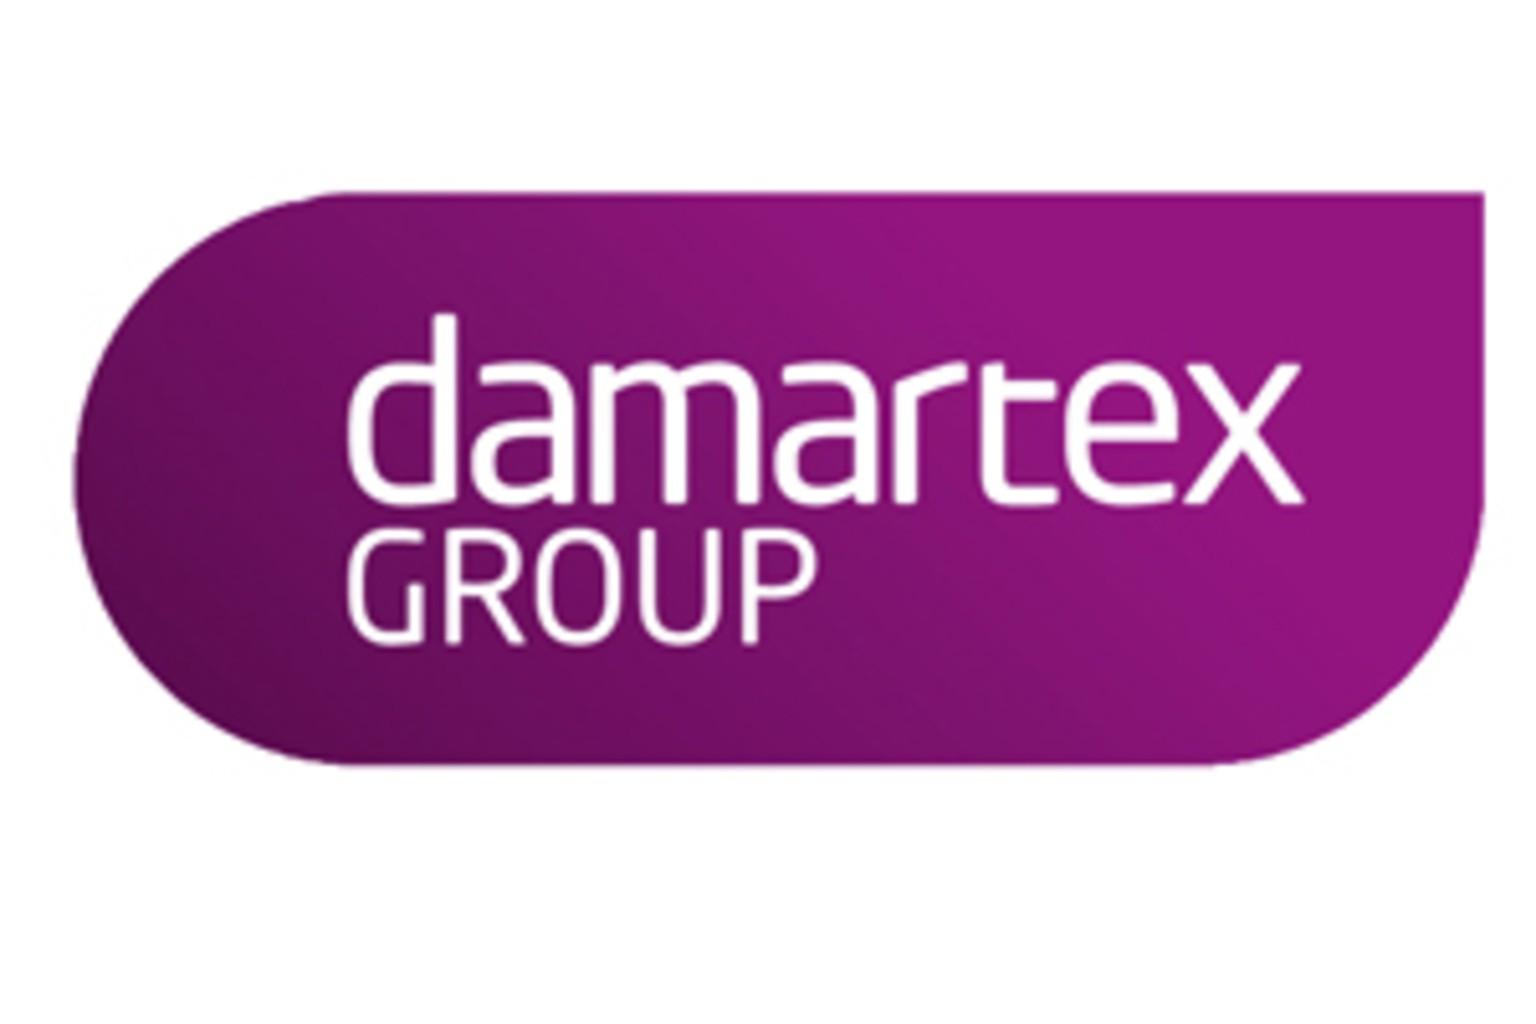 damartex_group_image